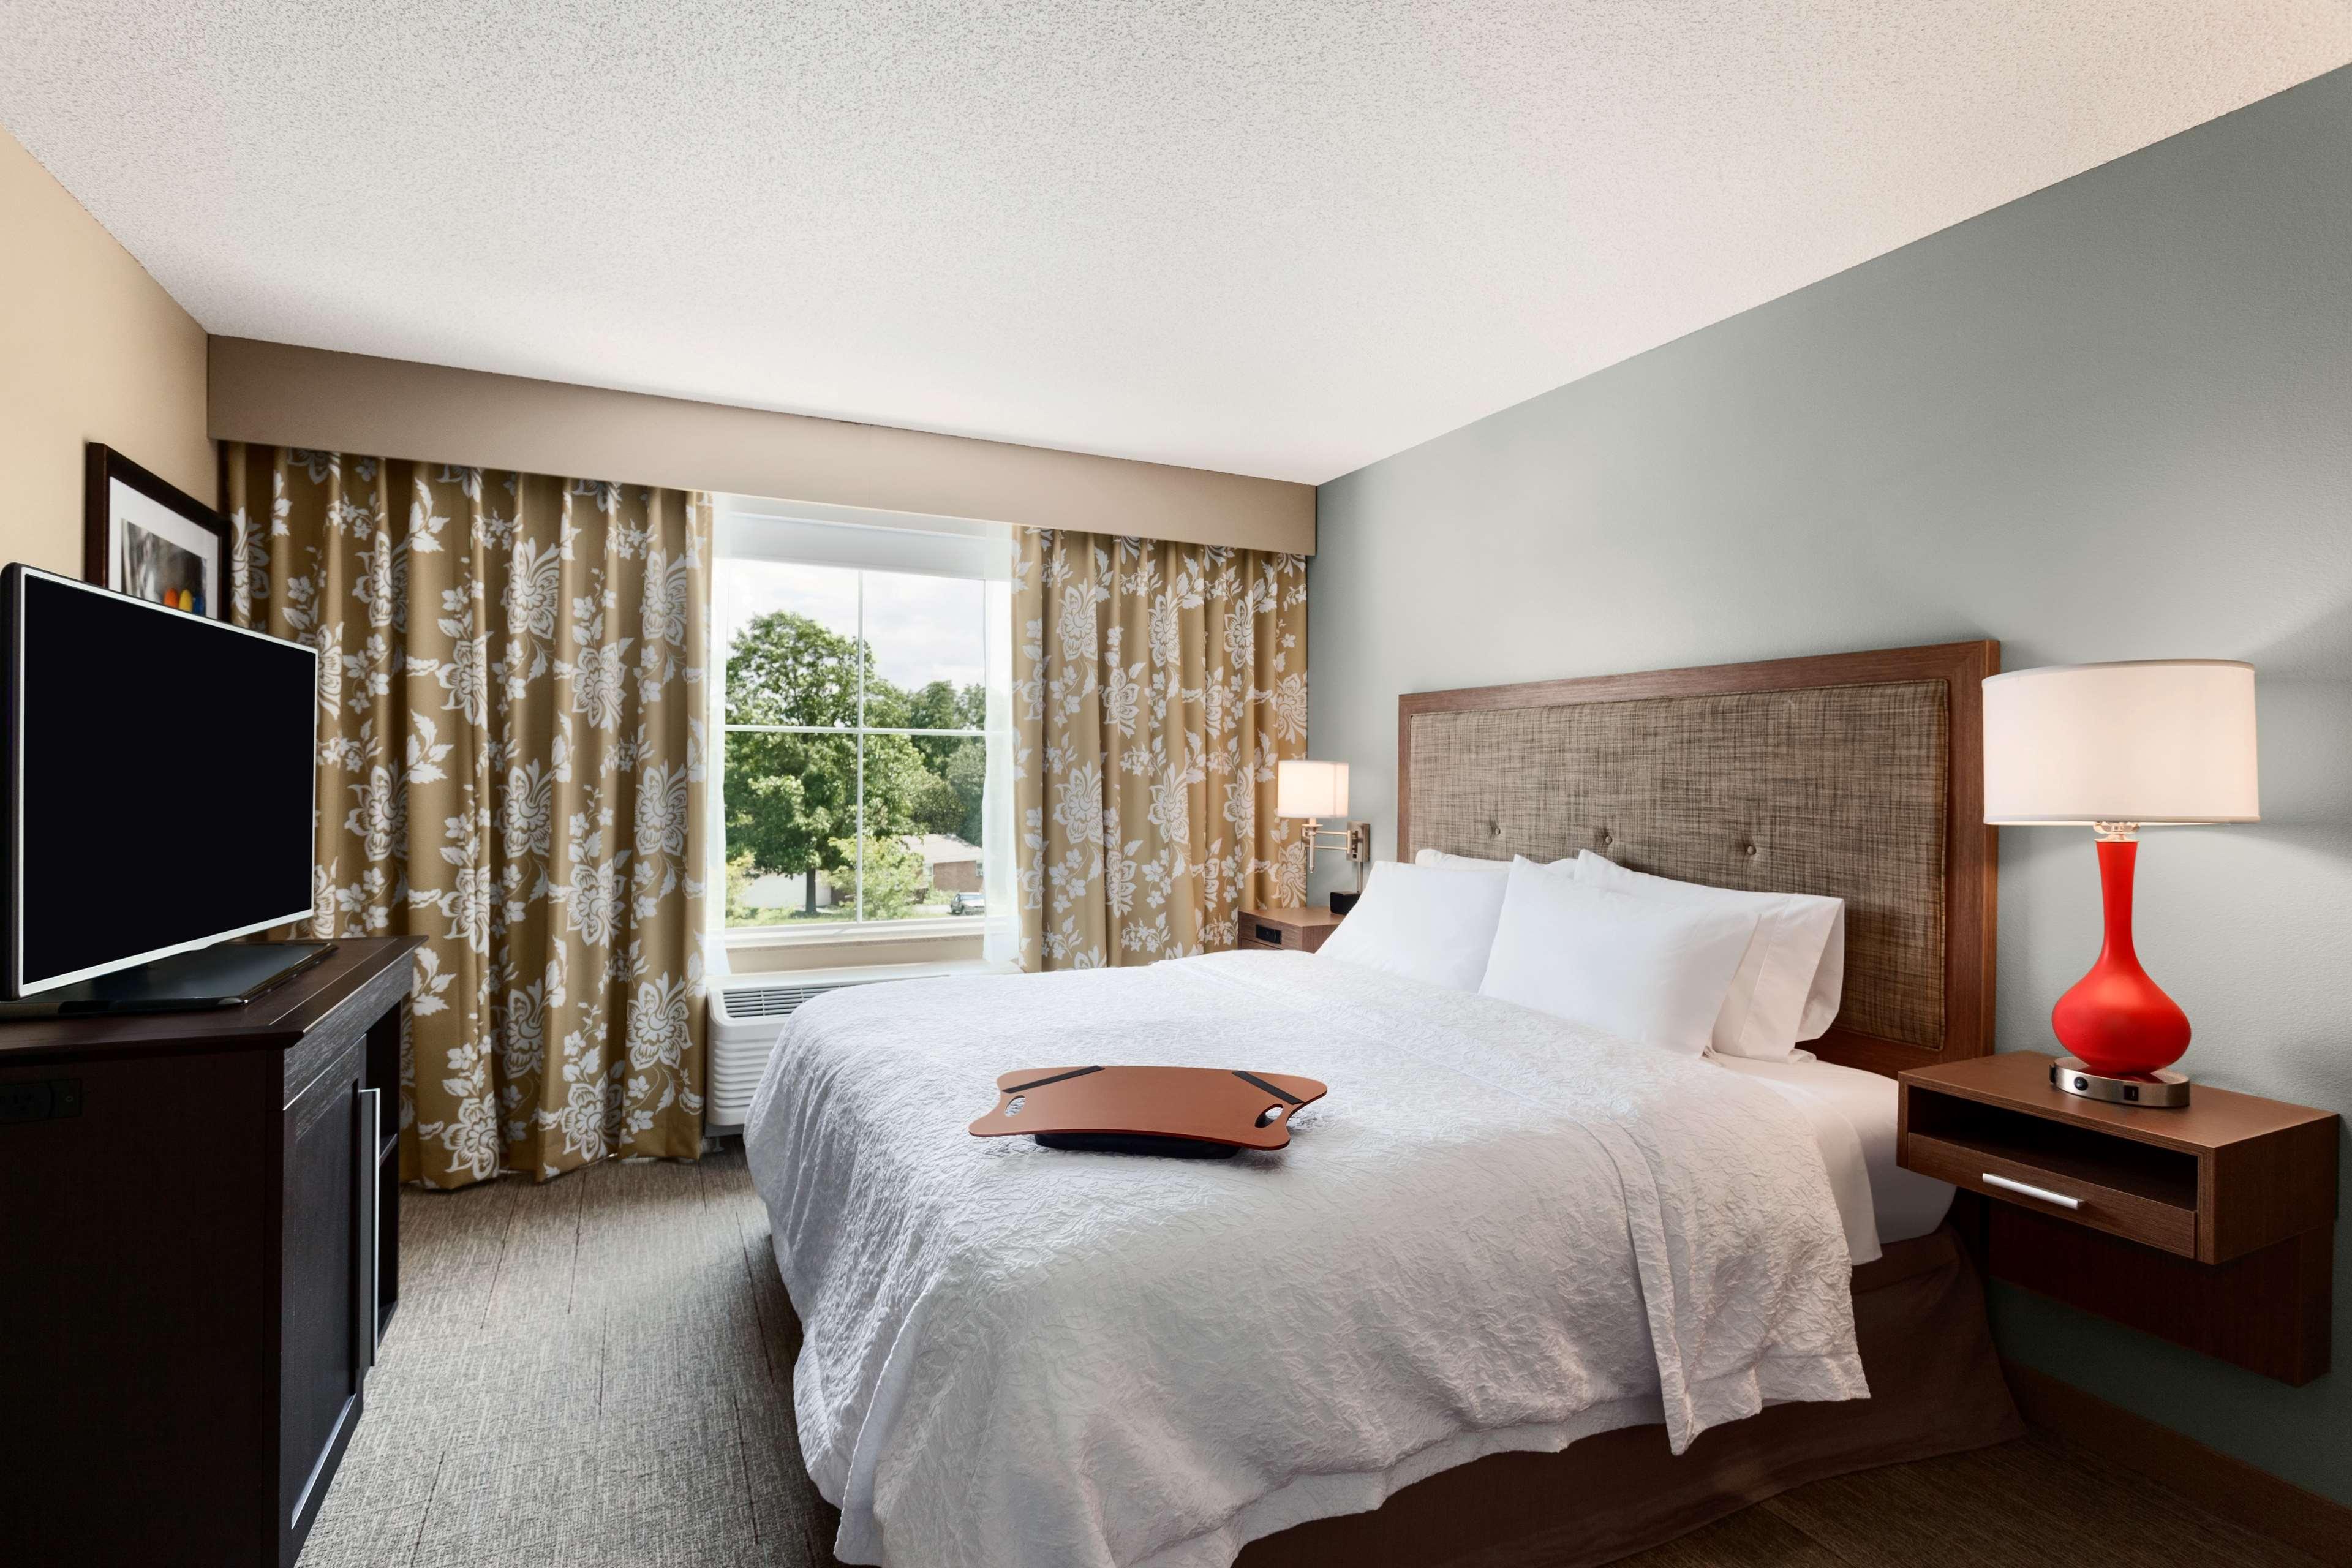 Hampton Inn & Suites Hershey Near The Park image 8